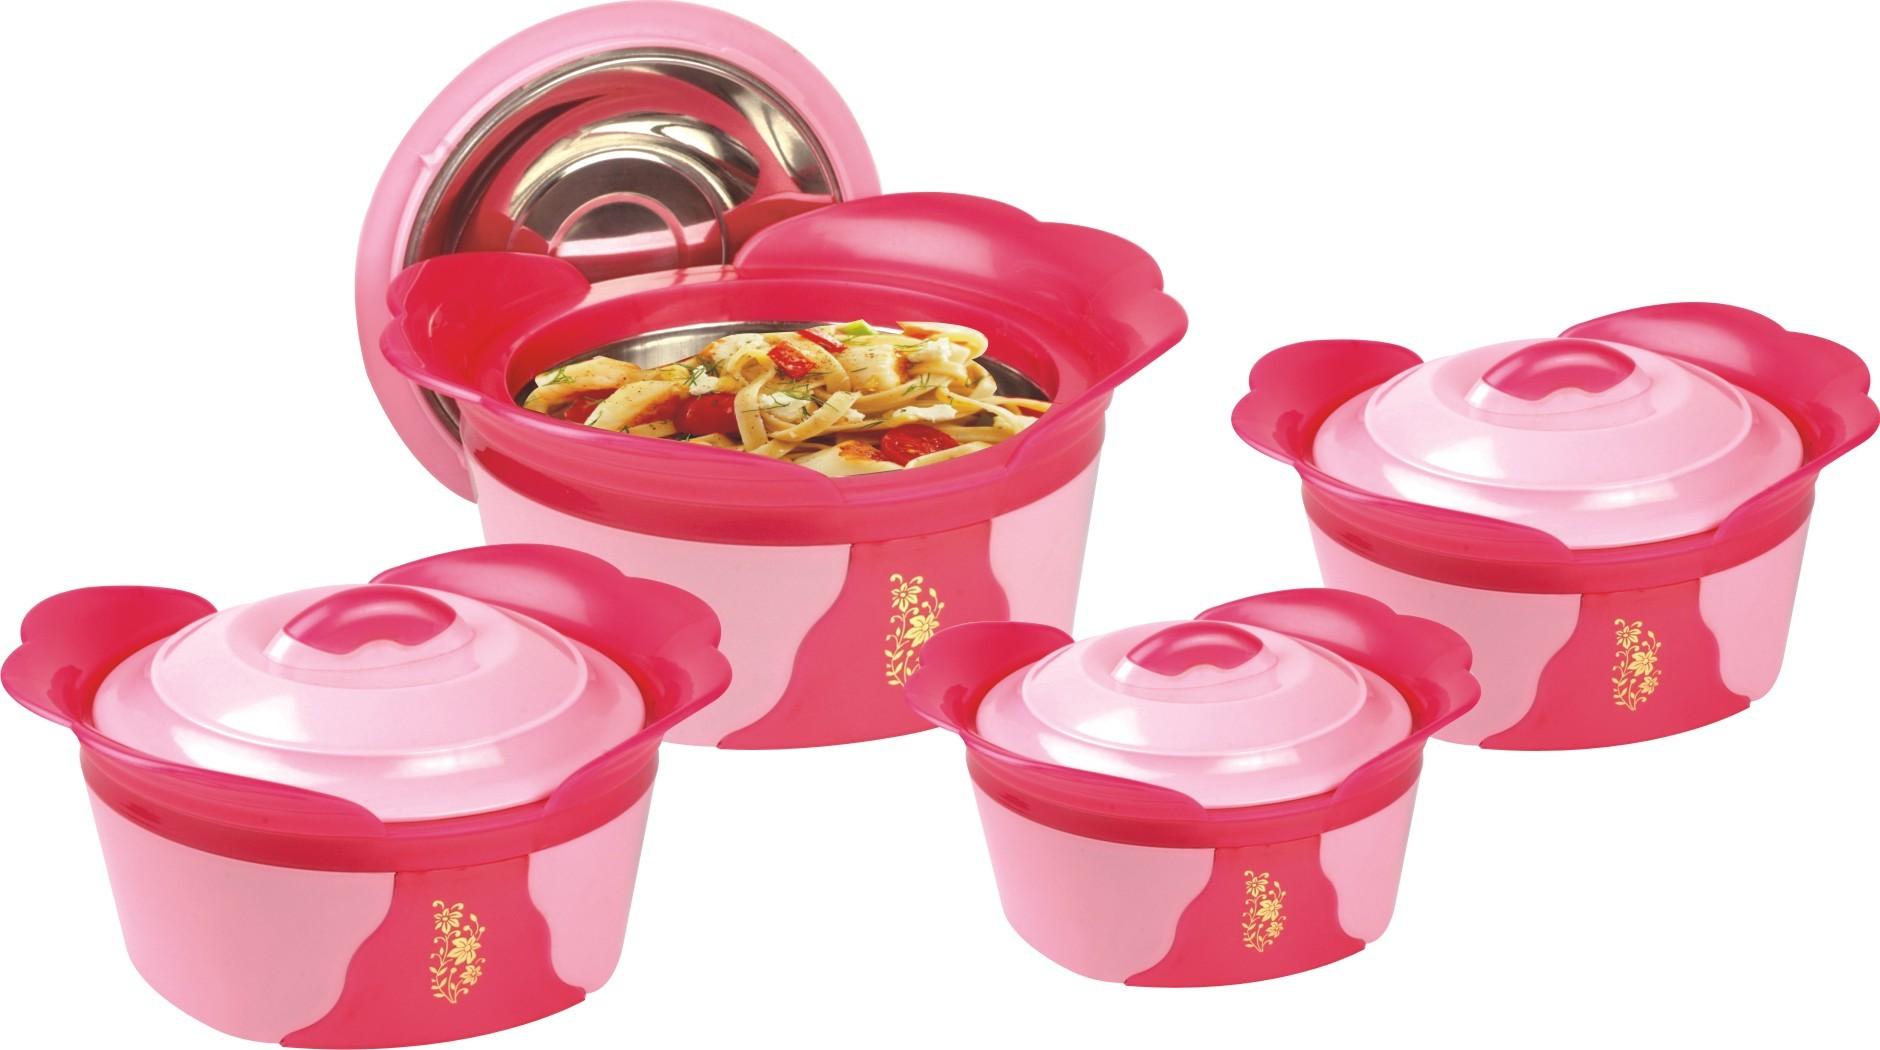 Regency 04 Piece Hot Pot Set